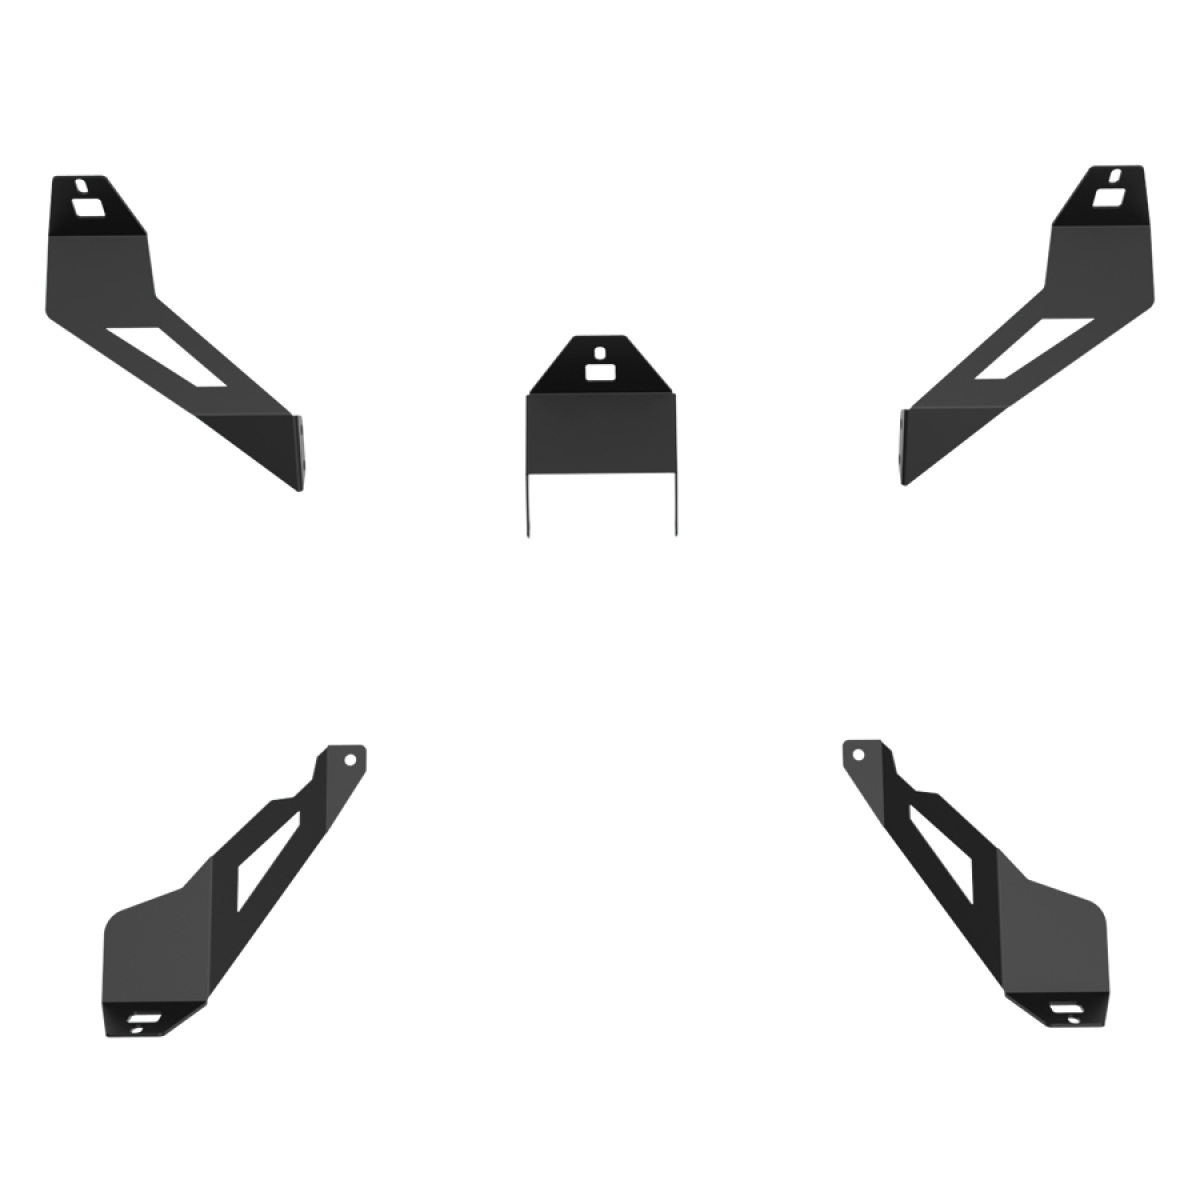 RSEAT S1 Speakers Mount Upgrade kit Black